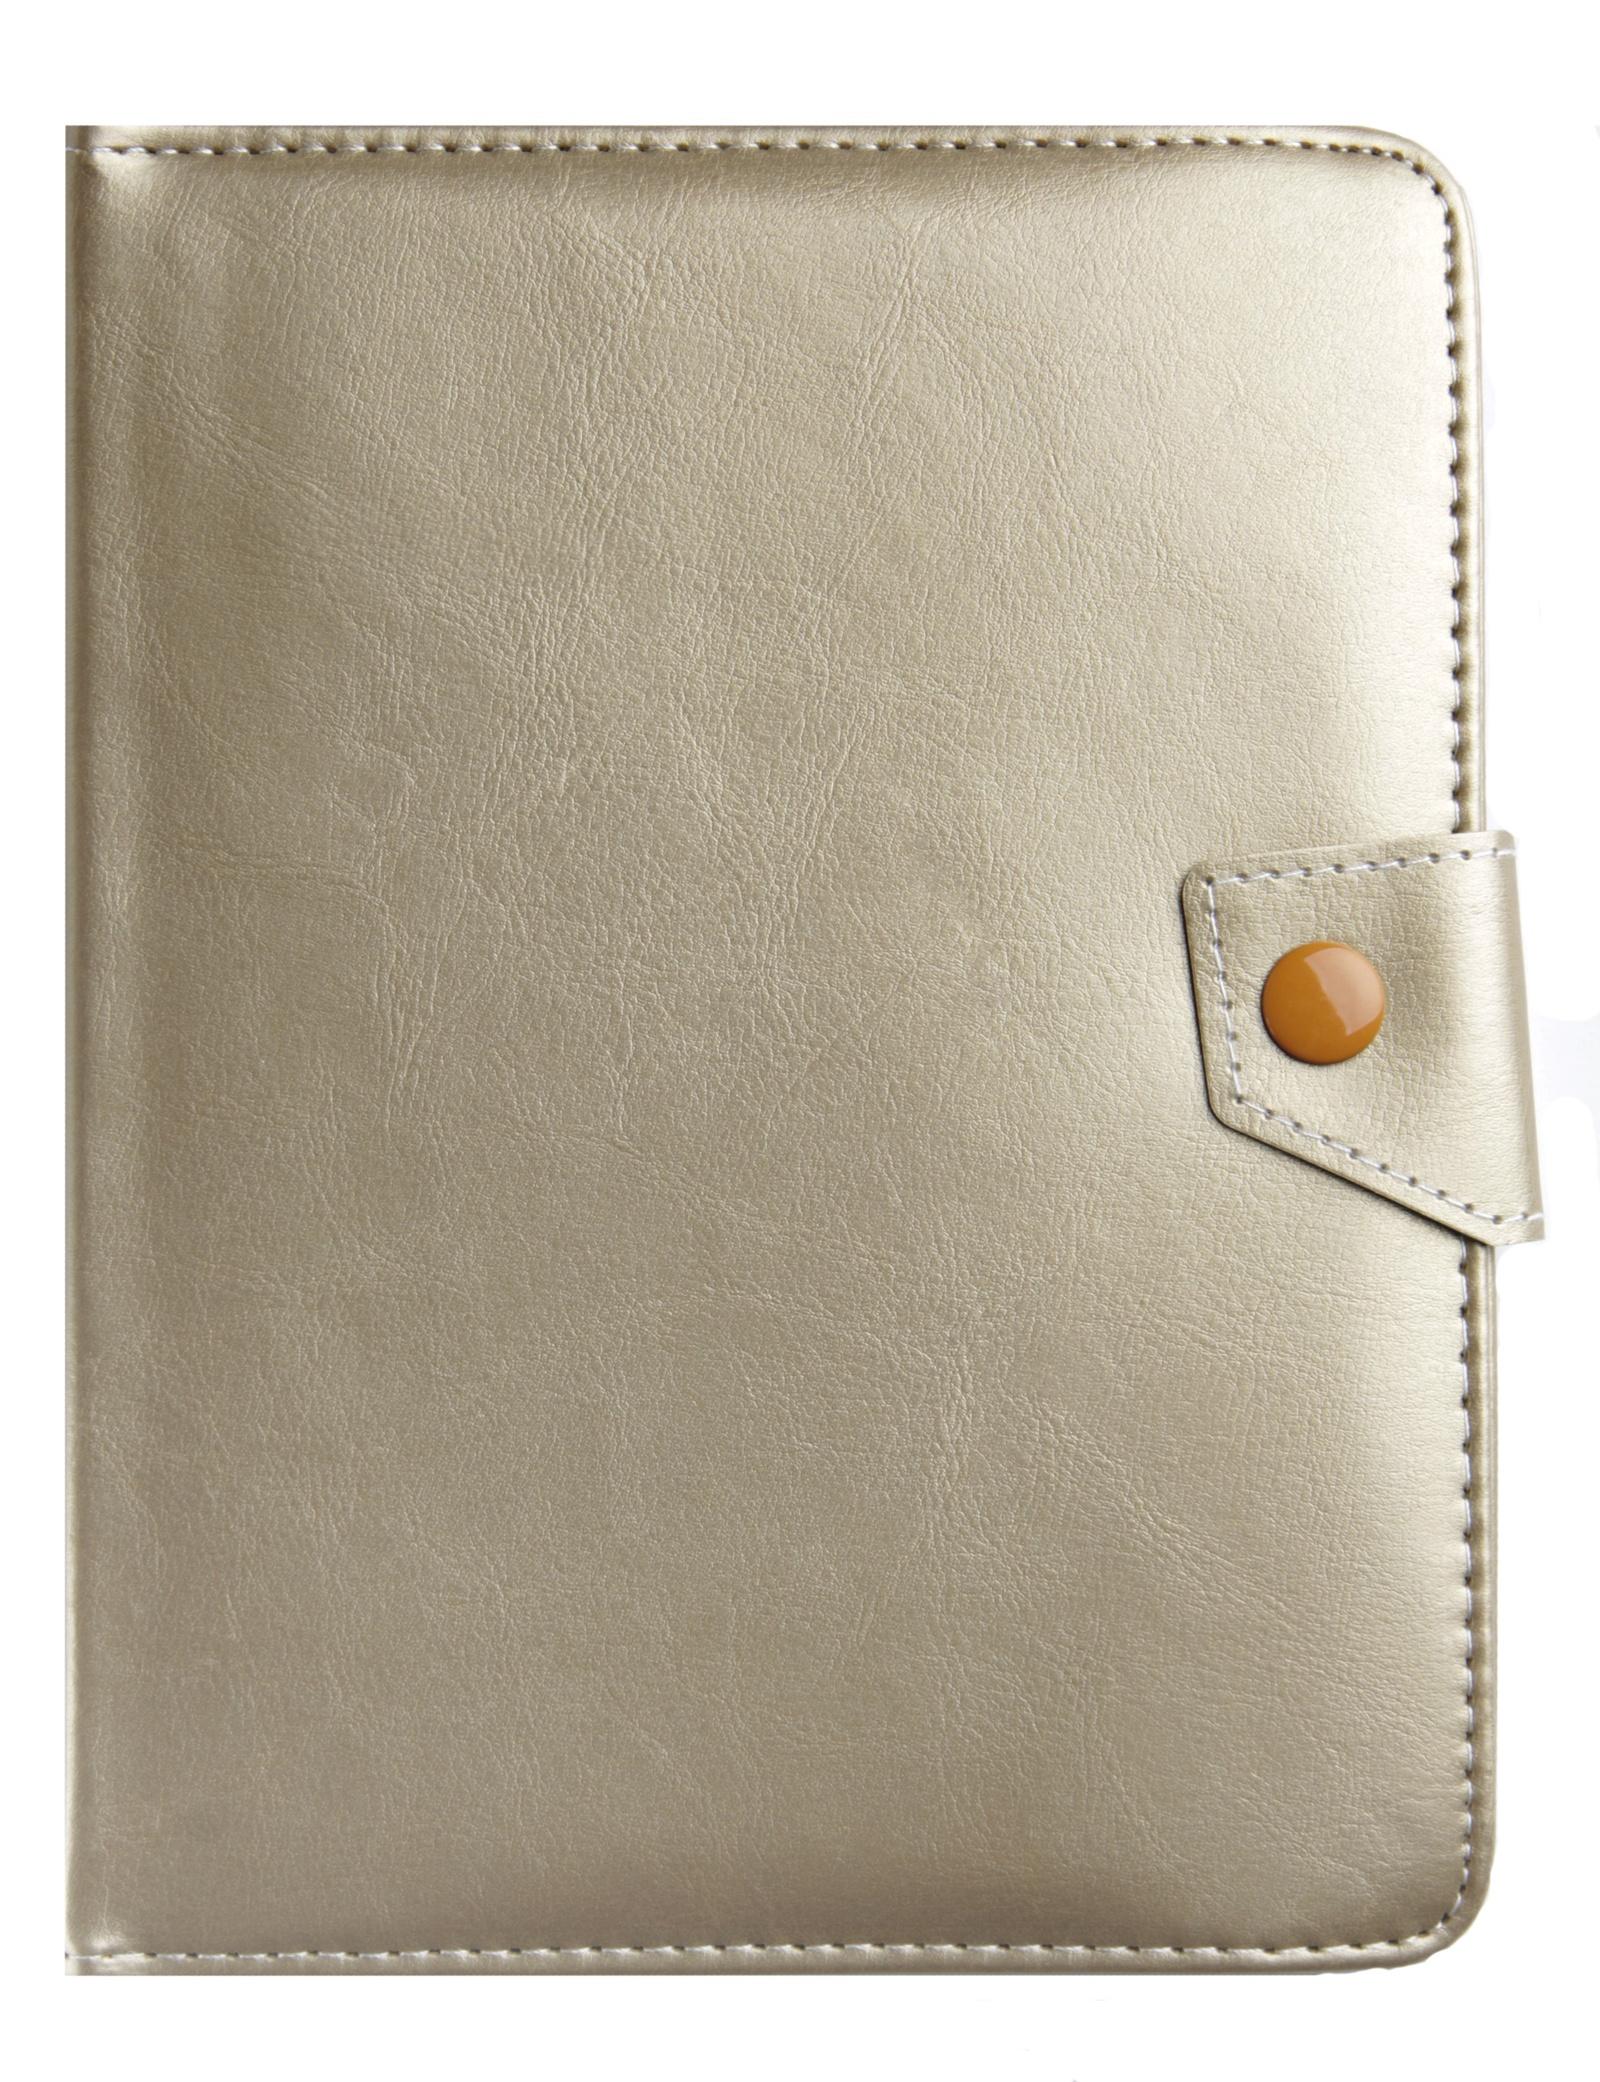 Чехол для планшета ProShield Standard clips10, 4660041409123, золотой чехол универсальный proshield standard clips8 2000000139876 золотистый